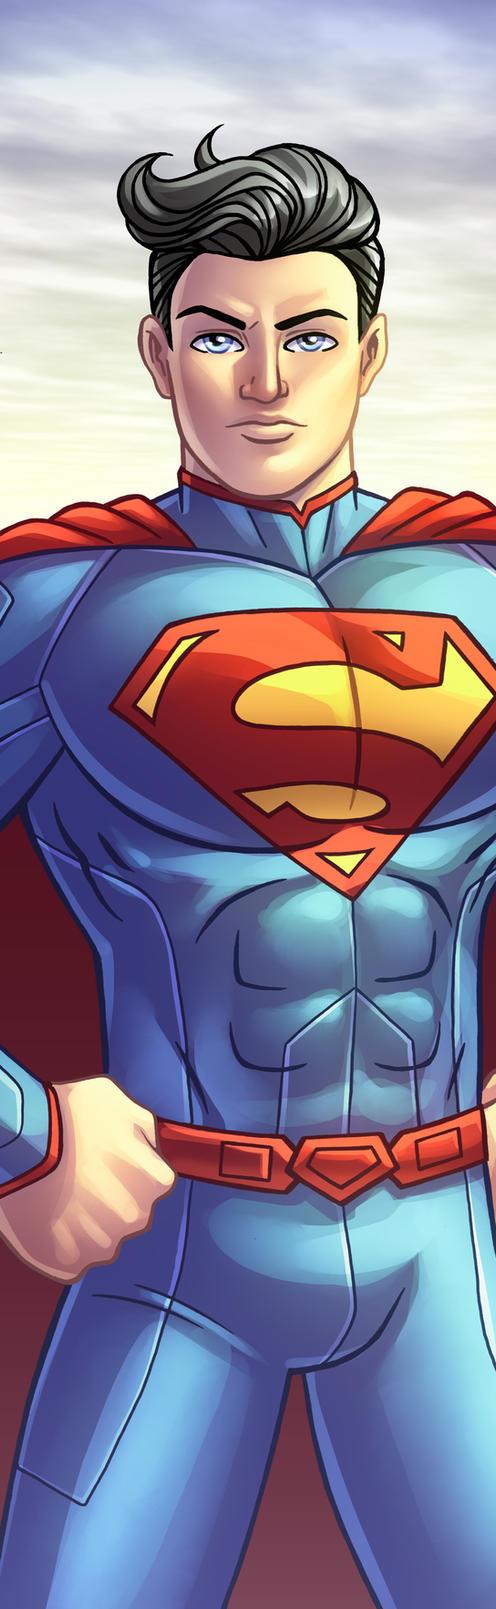 Superman Panel Art by RichBernatovech